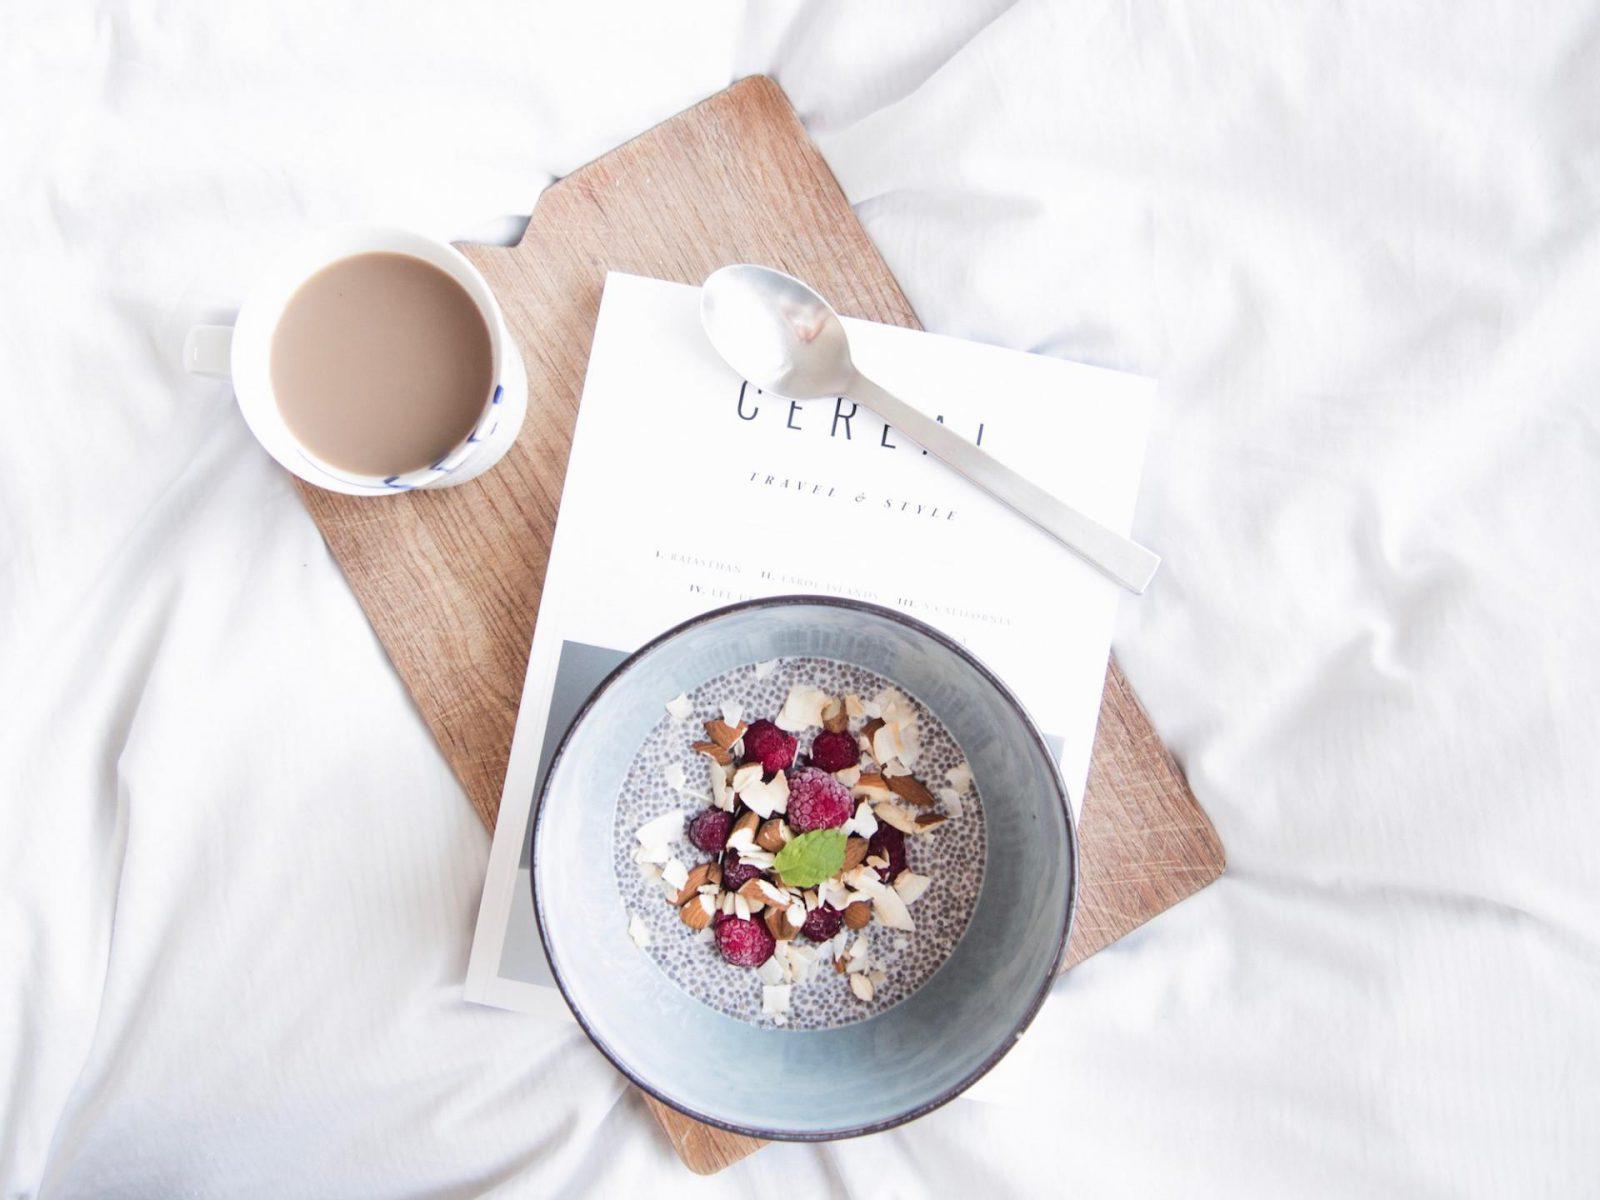 Recipe: Chia pudding with almond milk